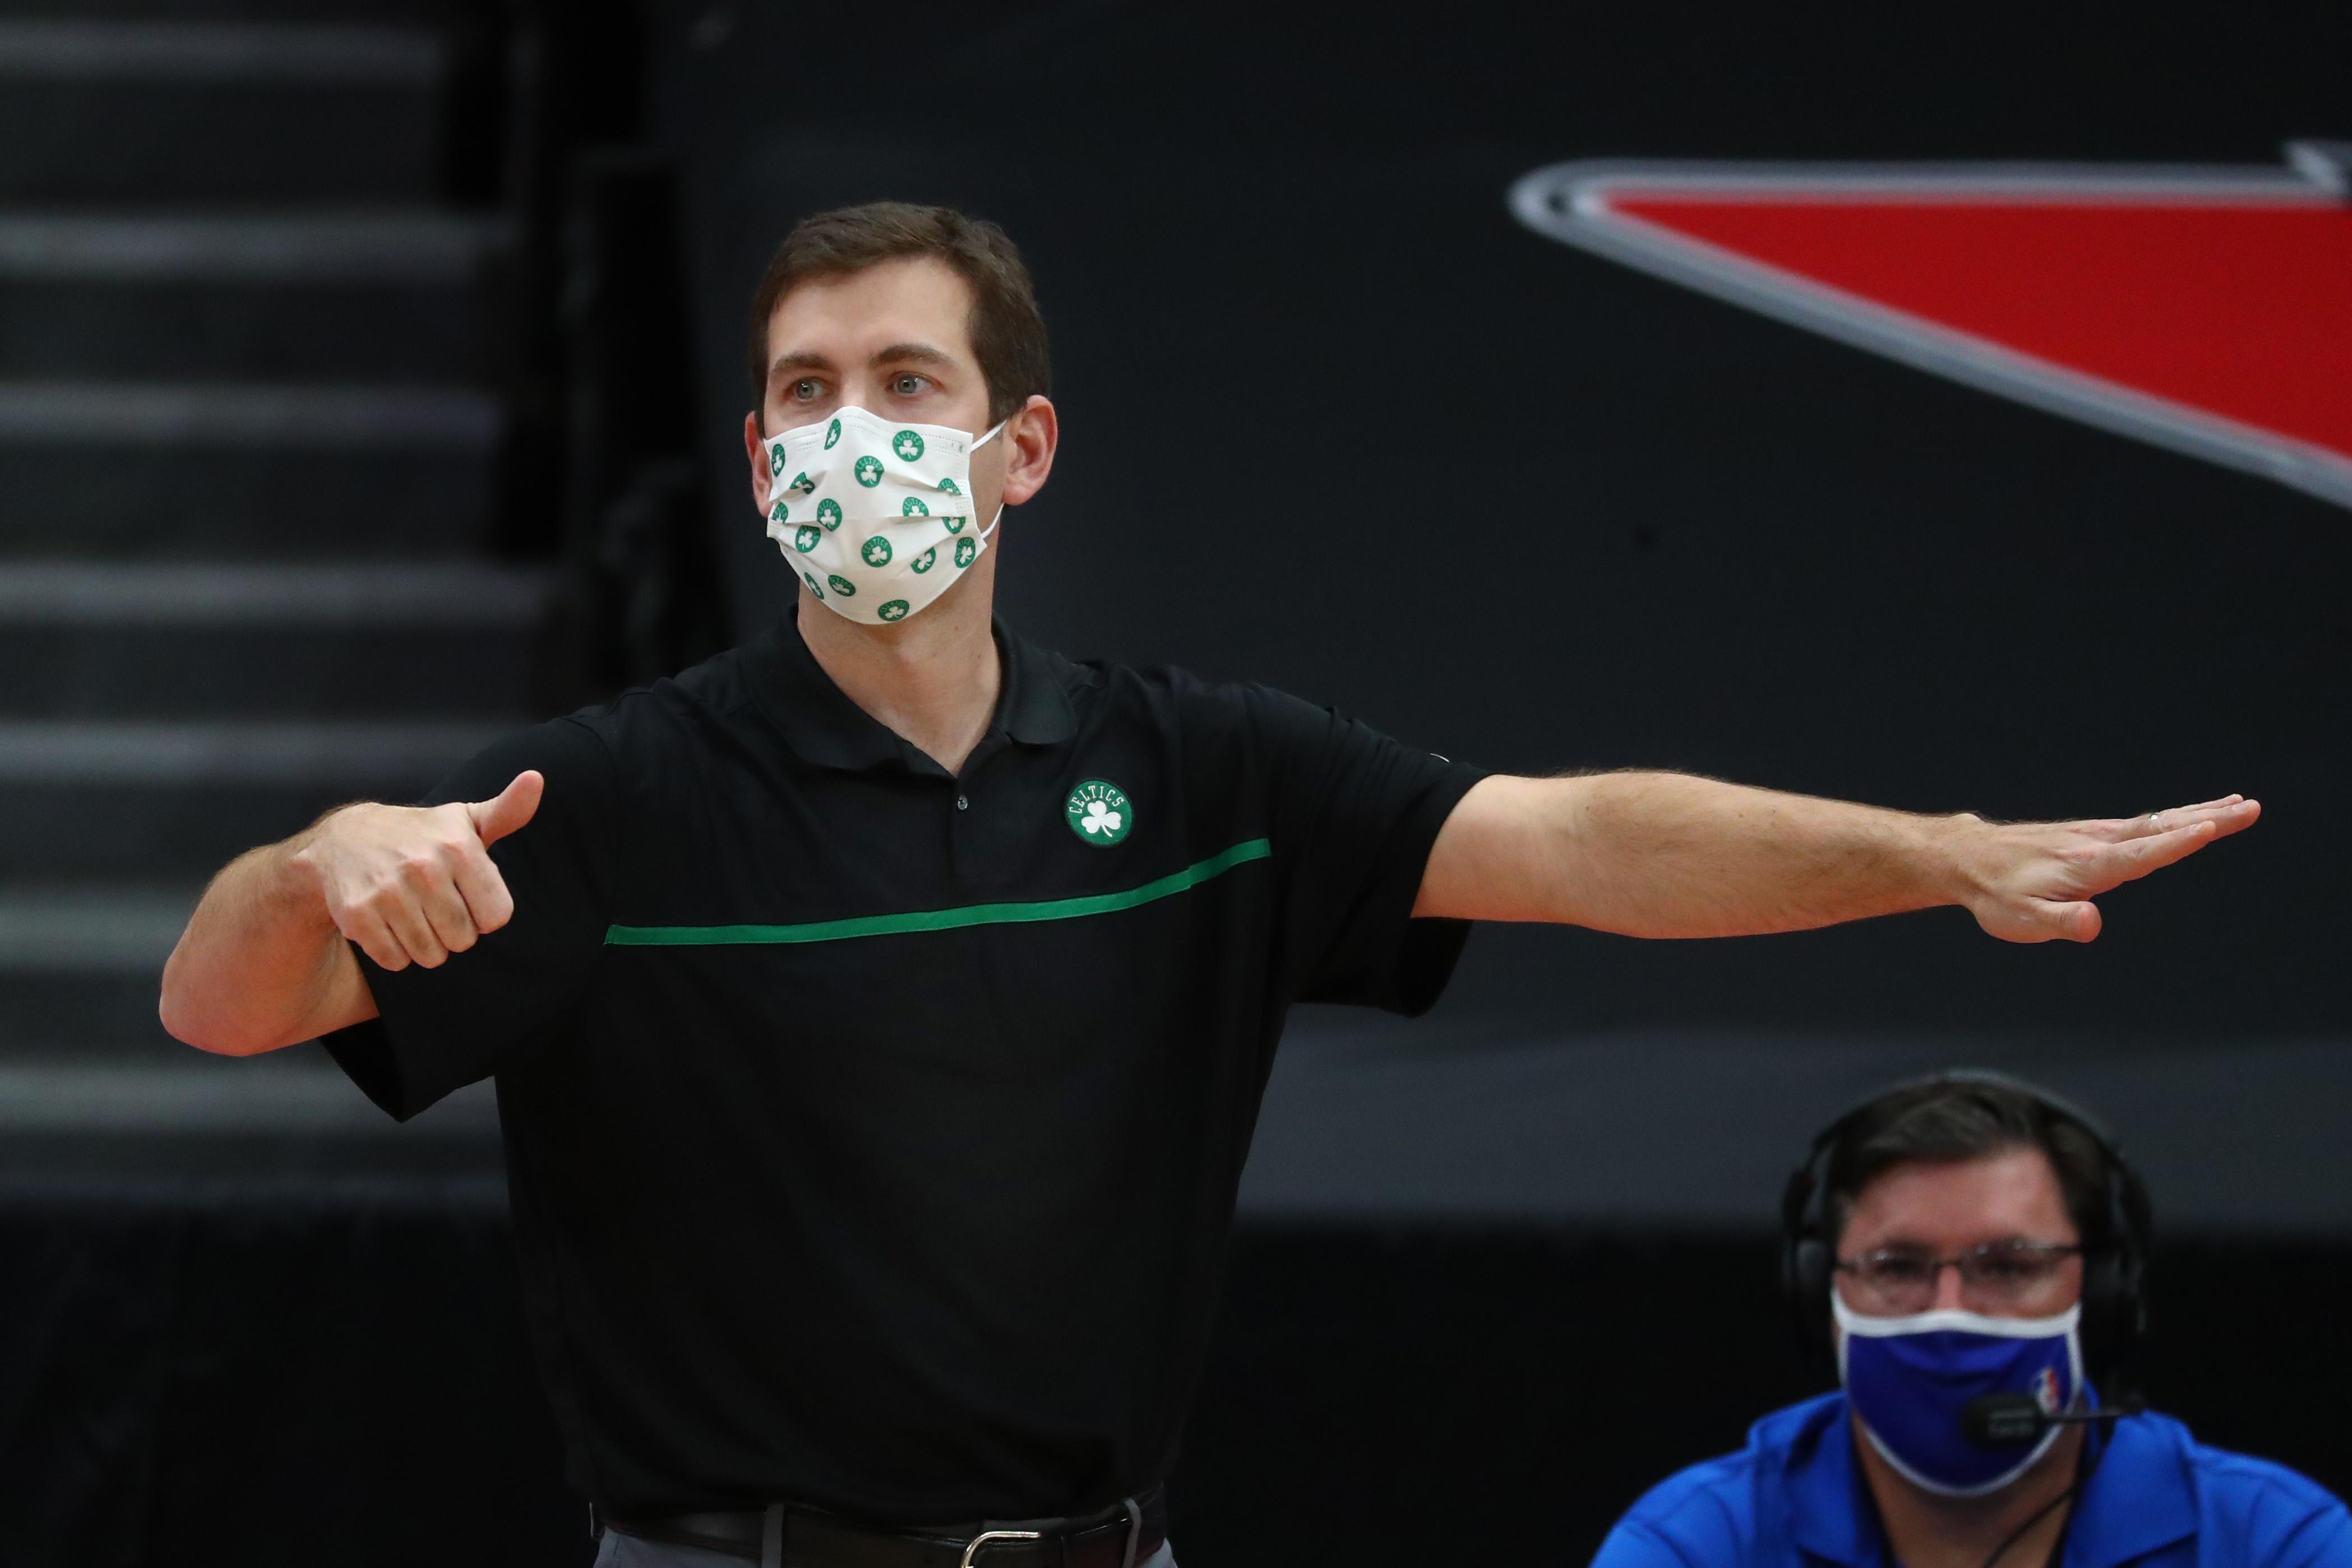 Jan 4, 2021; Tampa, Florida, USA; Boston Celtics head coach Brad Stevens against the Toronto Raptors during the second half at Amalie Arena. Mandatory Credit: Kim Klement-USA TODAY Sports